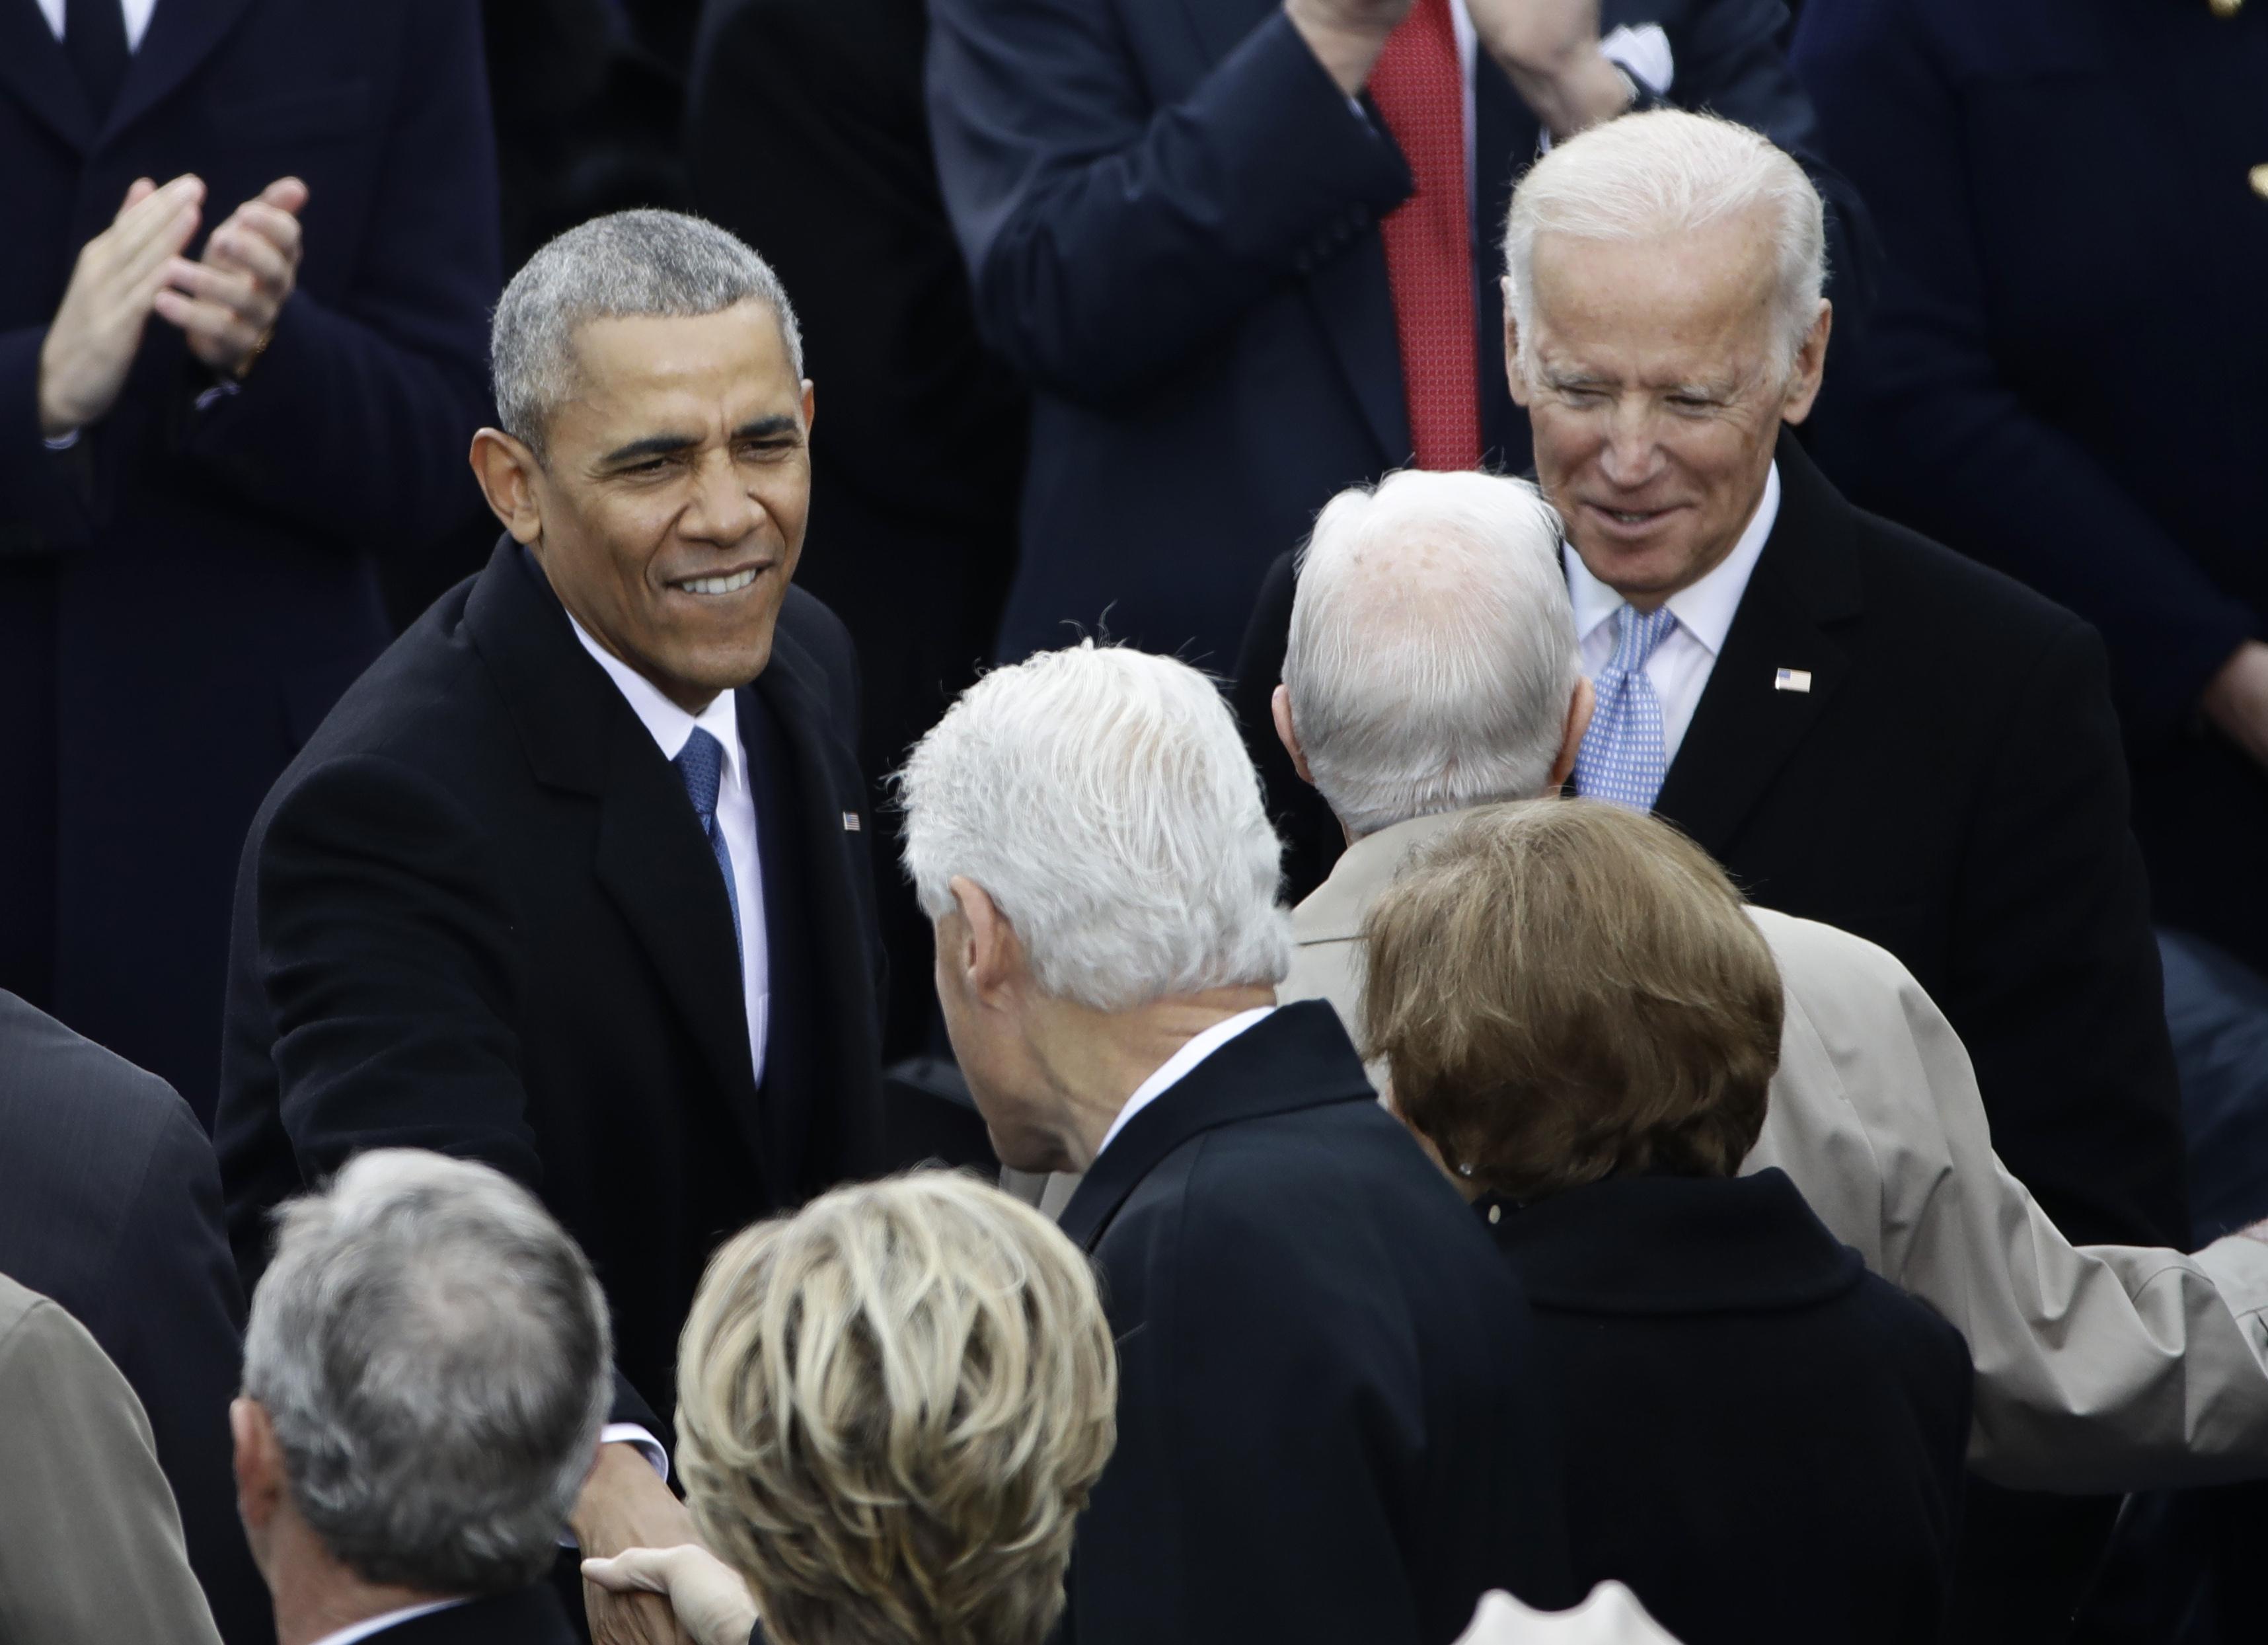 Obama Signs Final Bill Into Law Washington Times